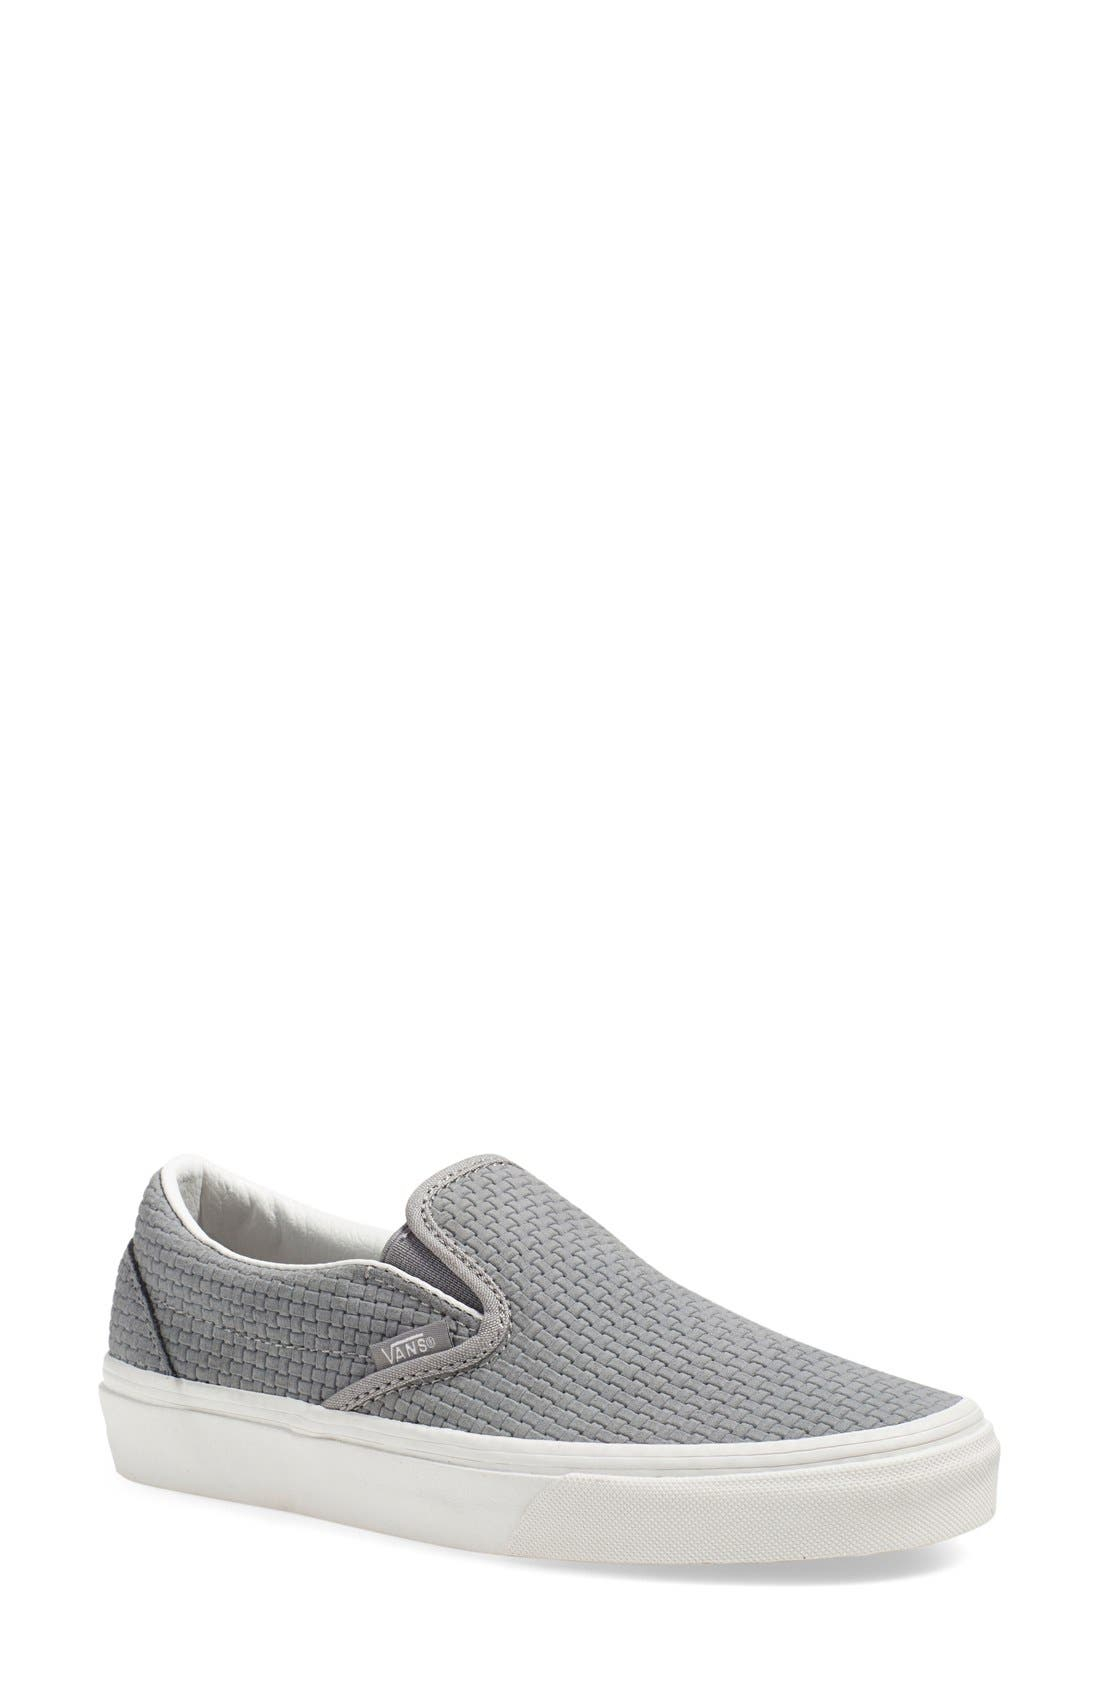 ,                             Classic Slip-On Sneaker,                             Main thumbnail 261, color,                             022